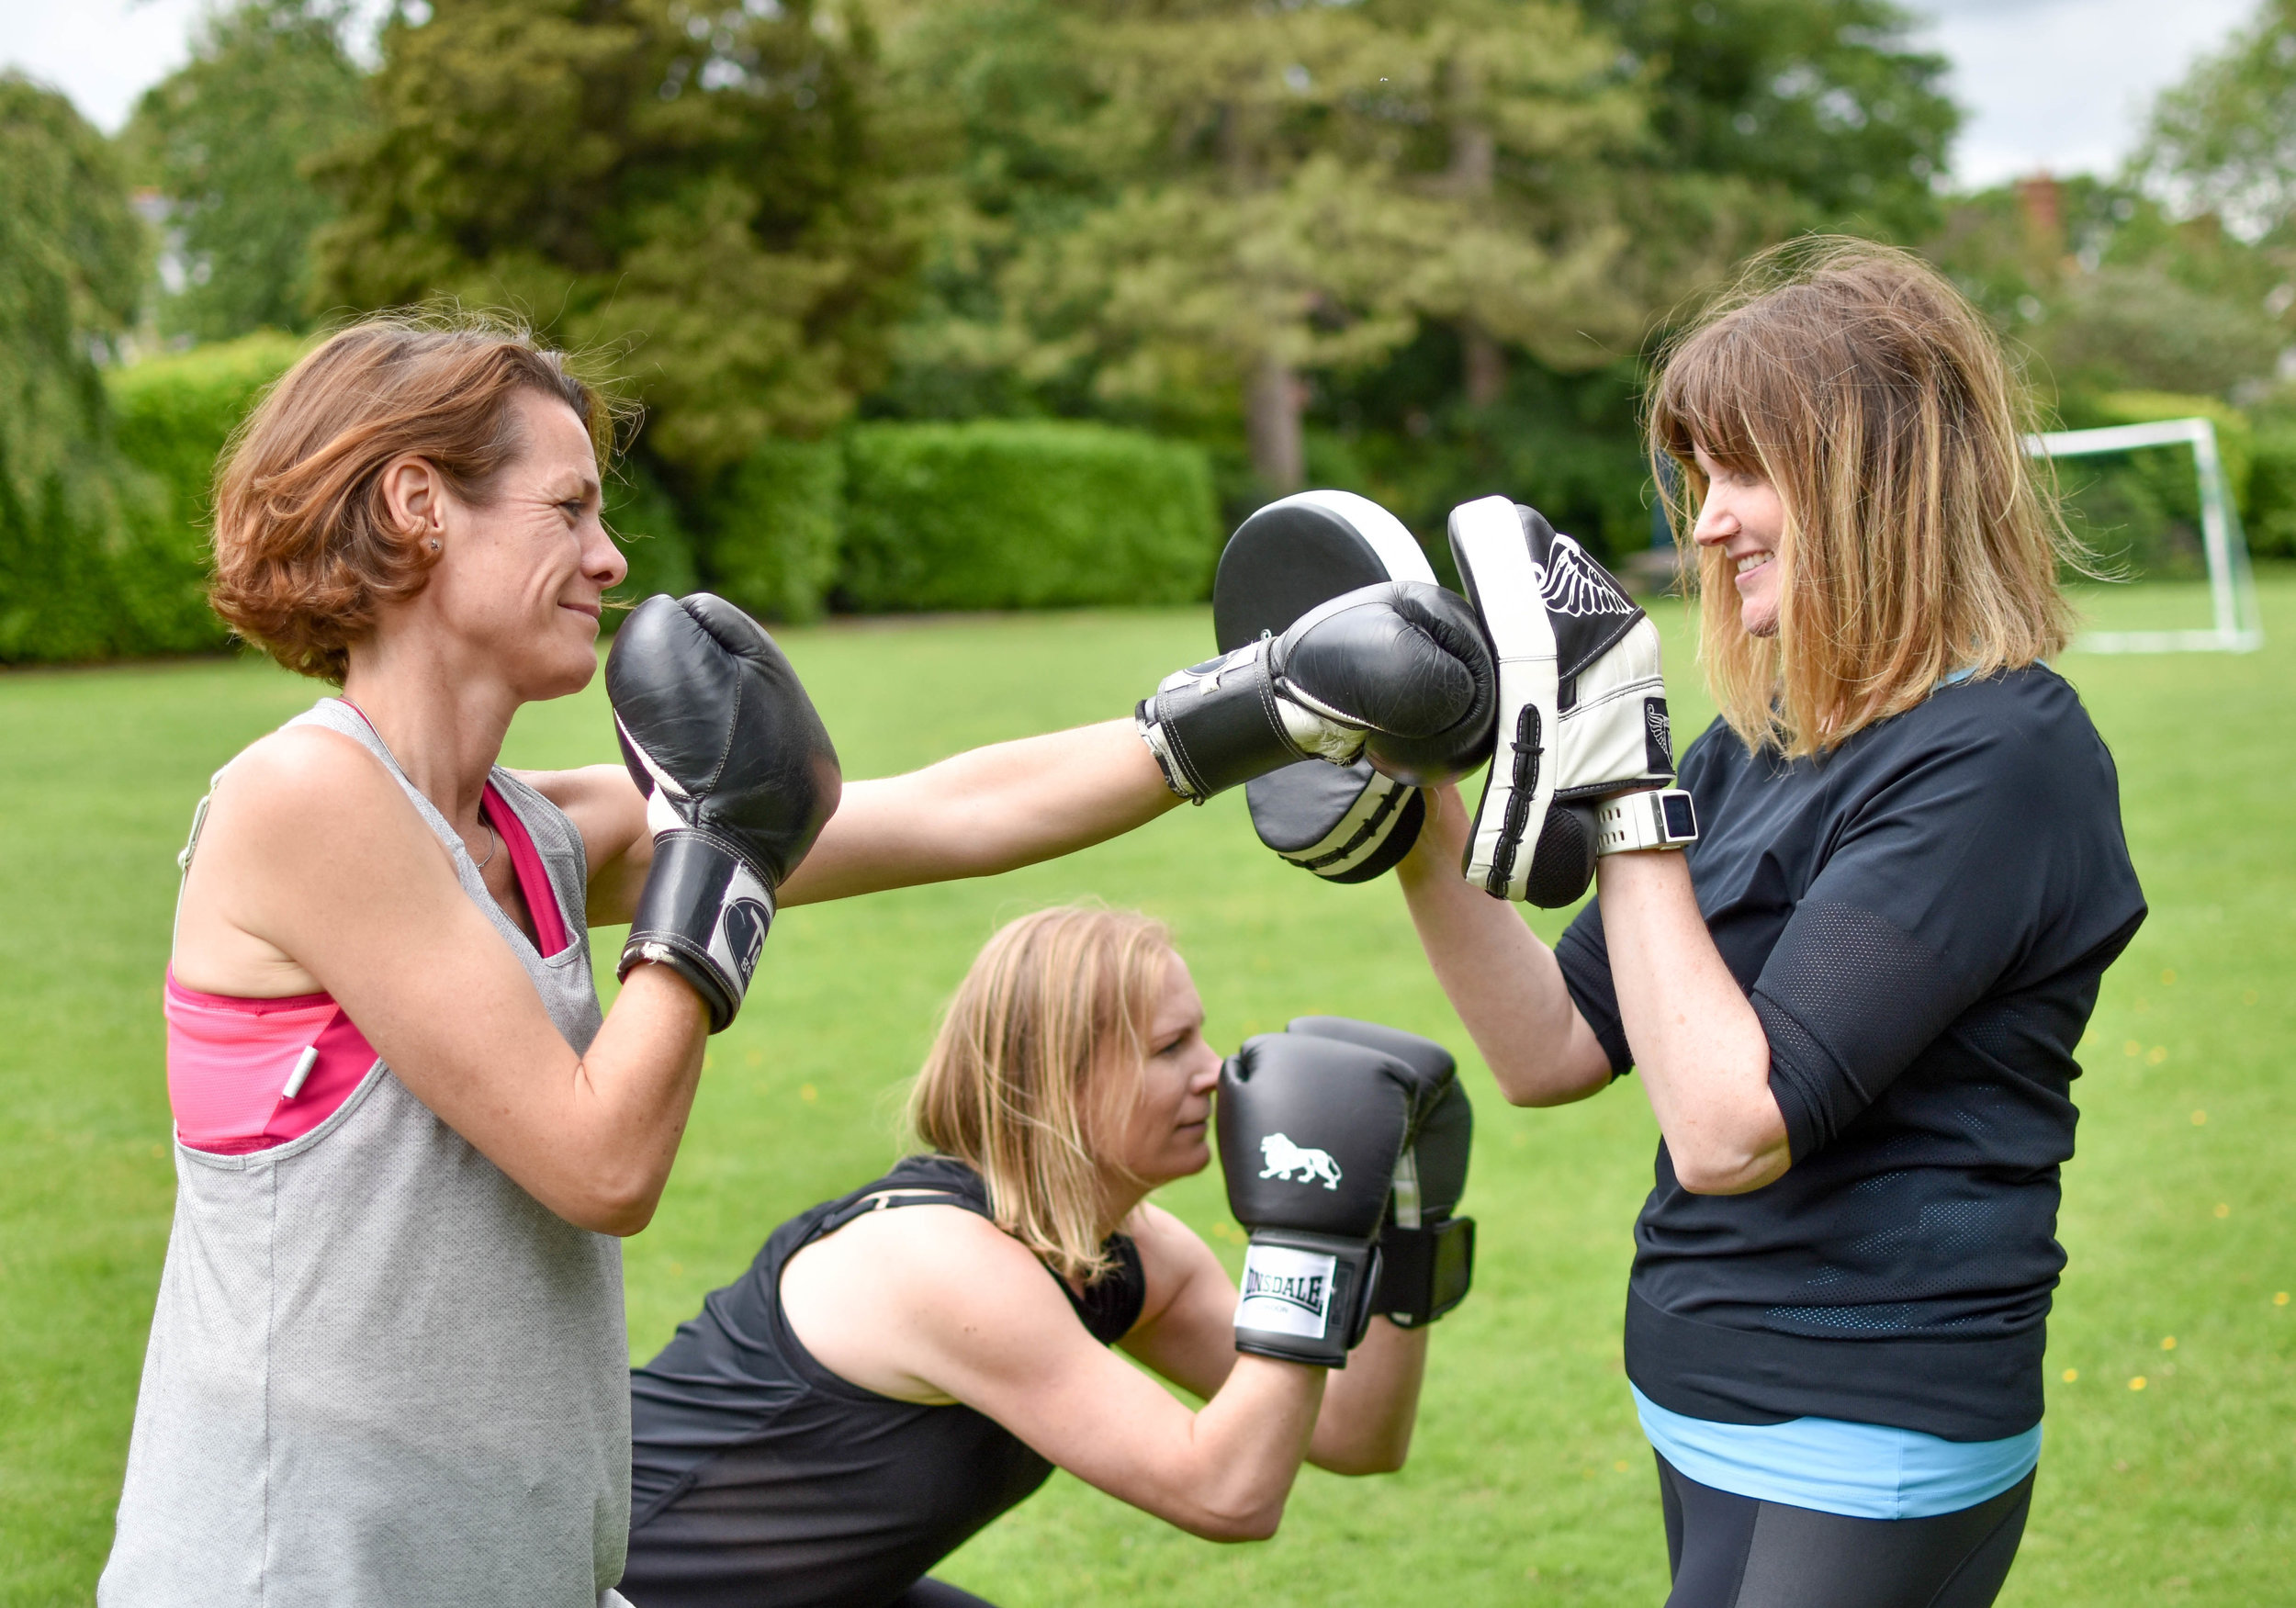 group-classes-women-boxing-sessions-tunbridge-wells-enjoy-training.jpg